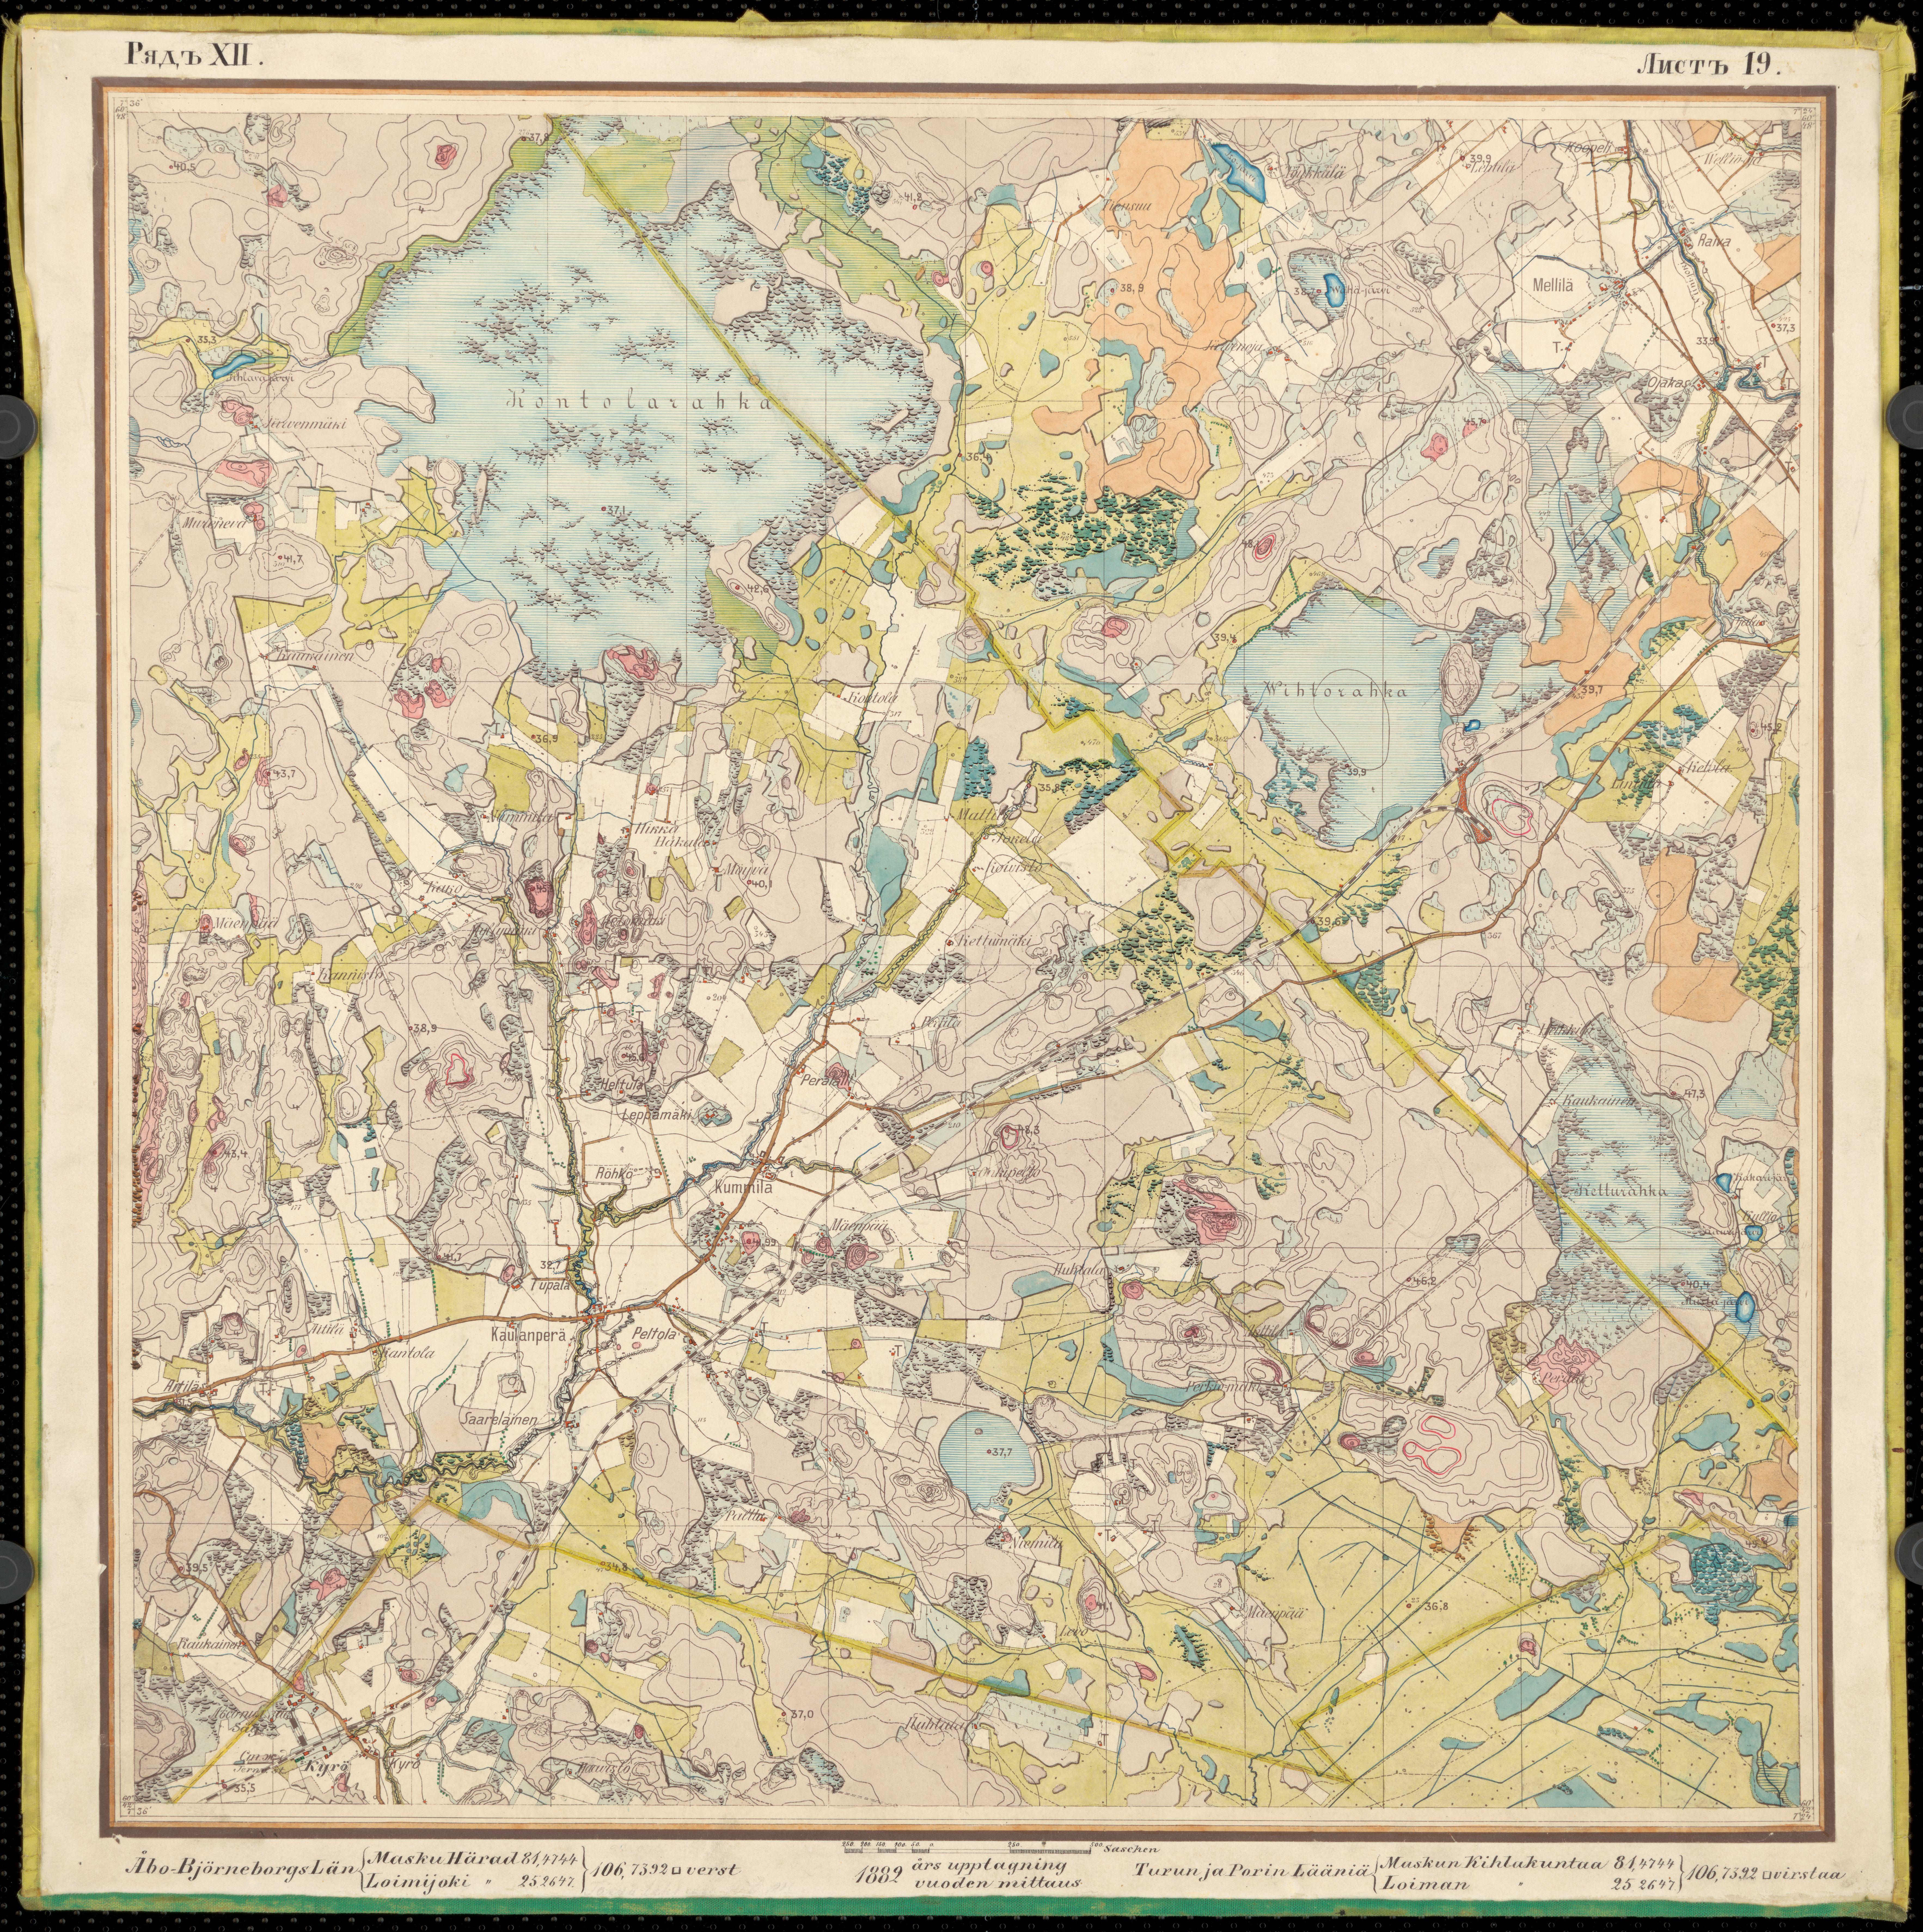 File Senate Atlas 1870 1907 Sheet Xii 19 Poytya Jpg Wikimedia